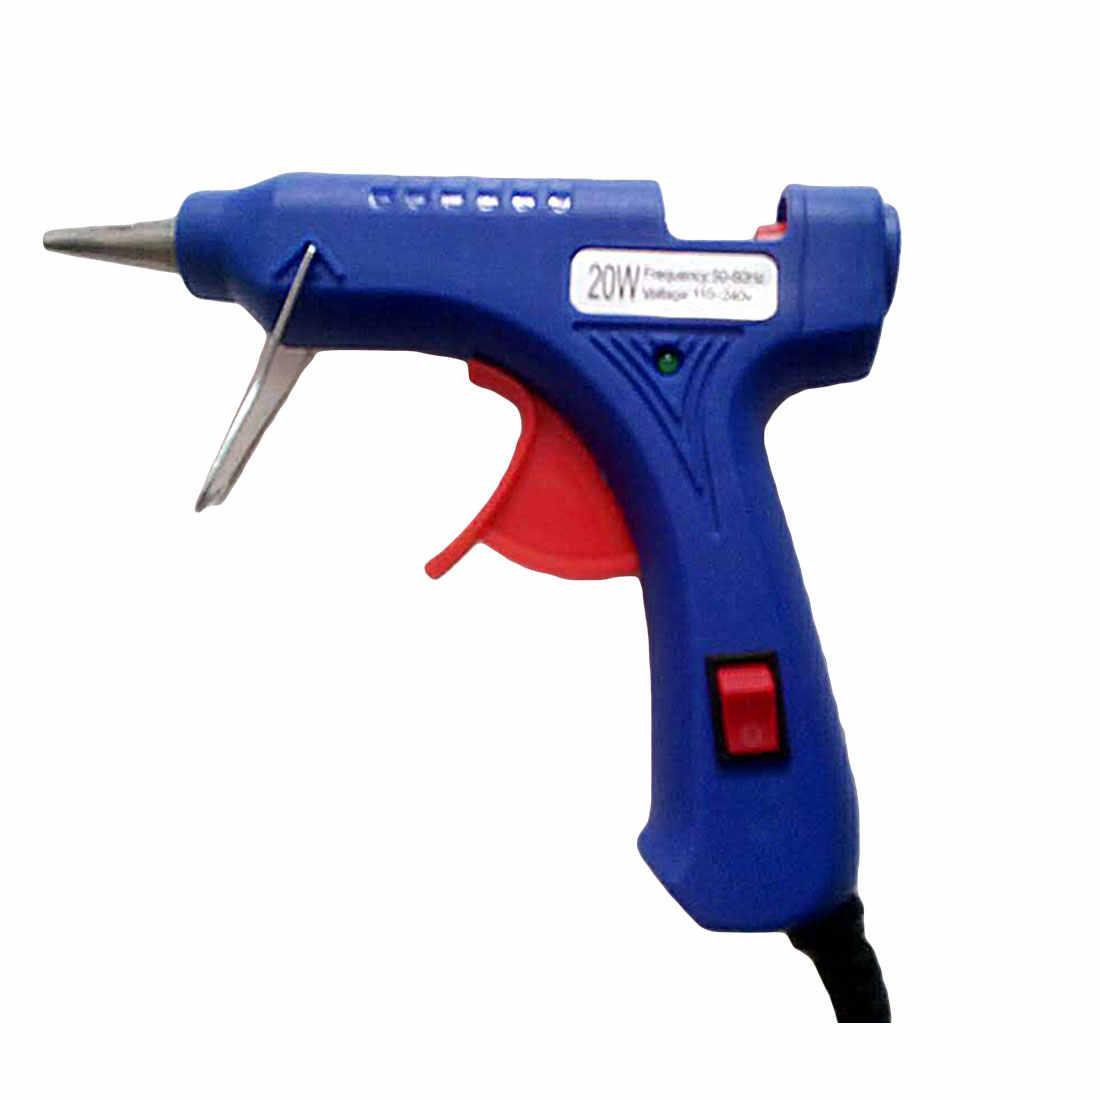 20W EU Plug Hot Melt กาวปืนซิลิโคนไฟฟ้าปืน Thermo Gluegun ซ่อมแซมความร้อนอุณหภูมิเครื่องมือ